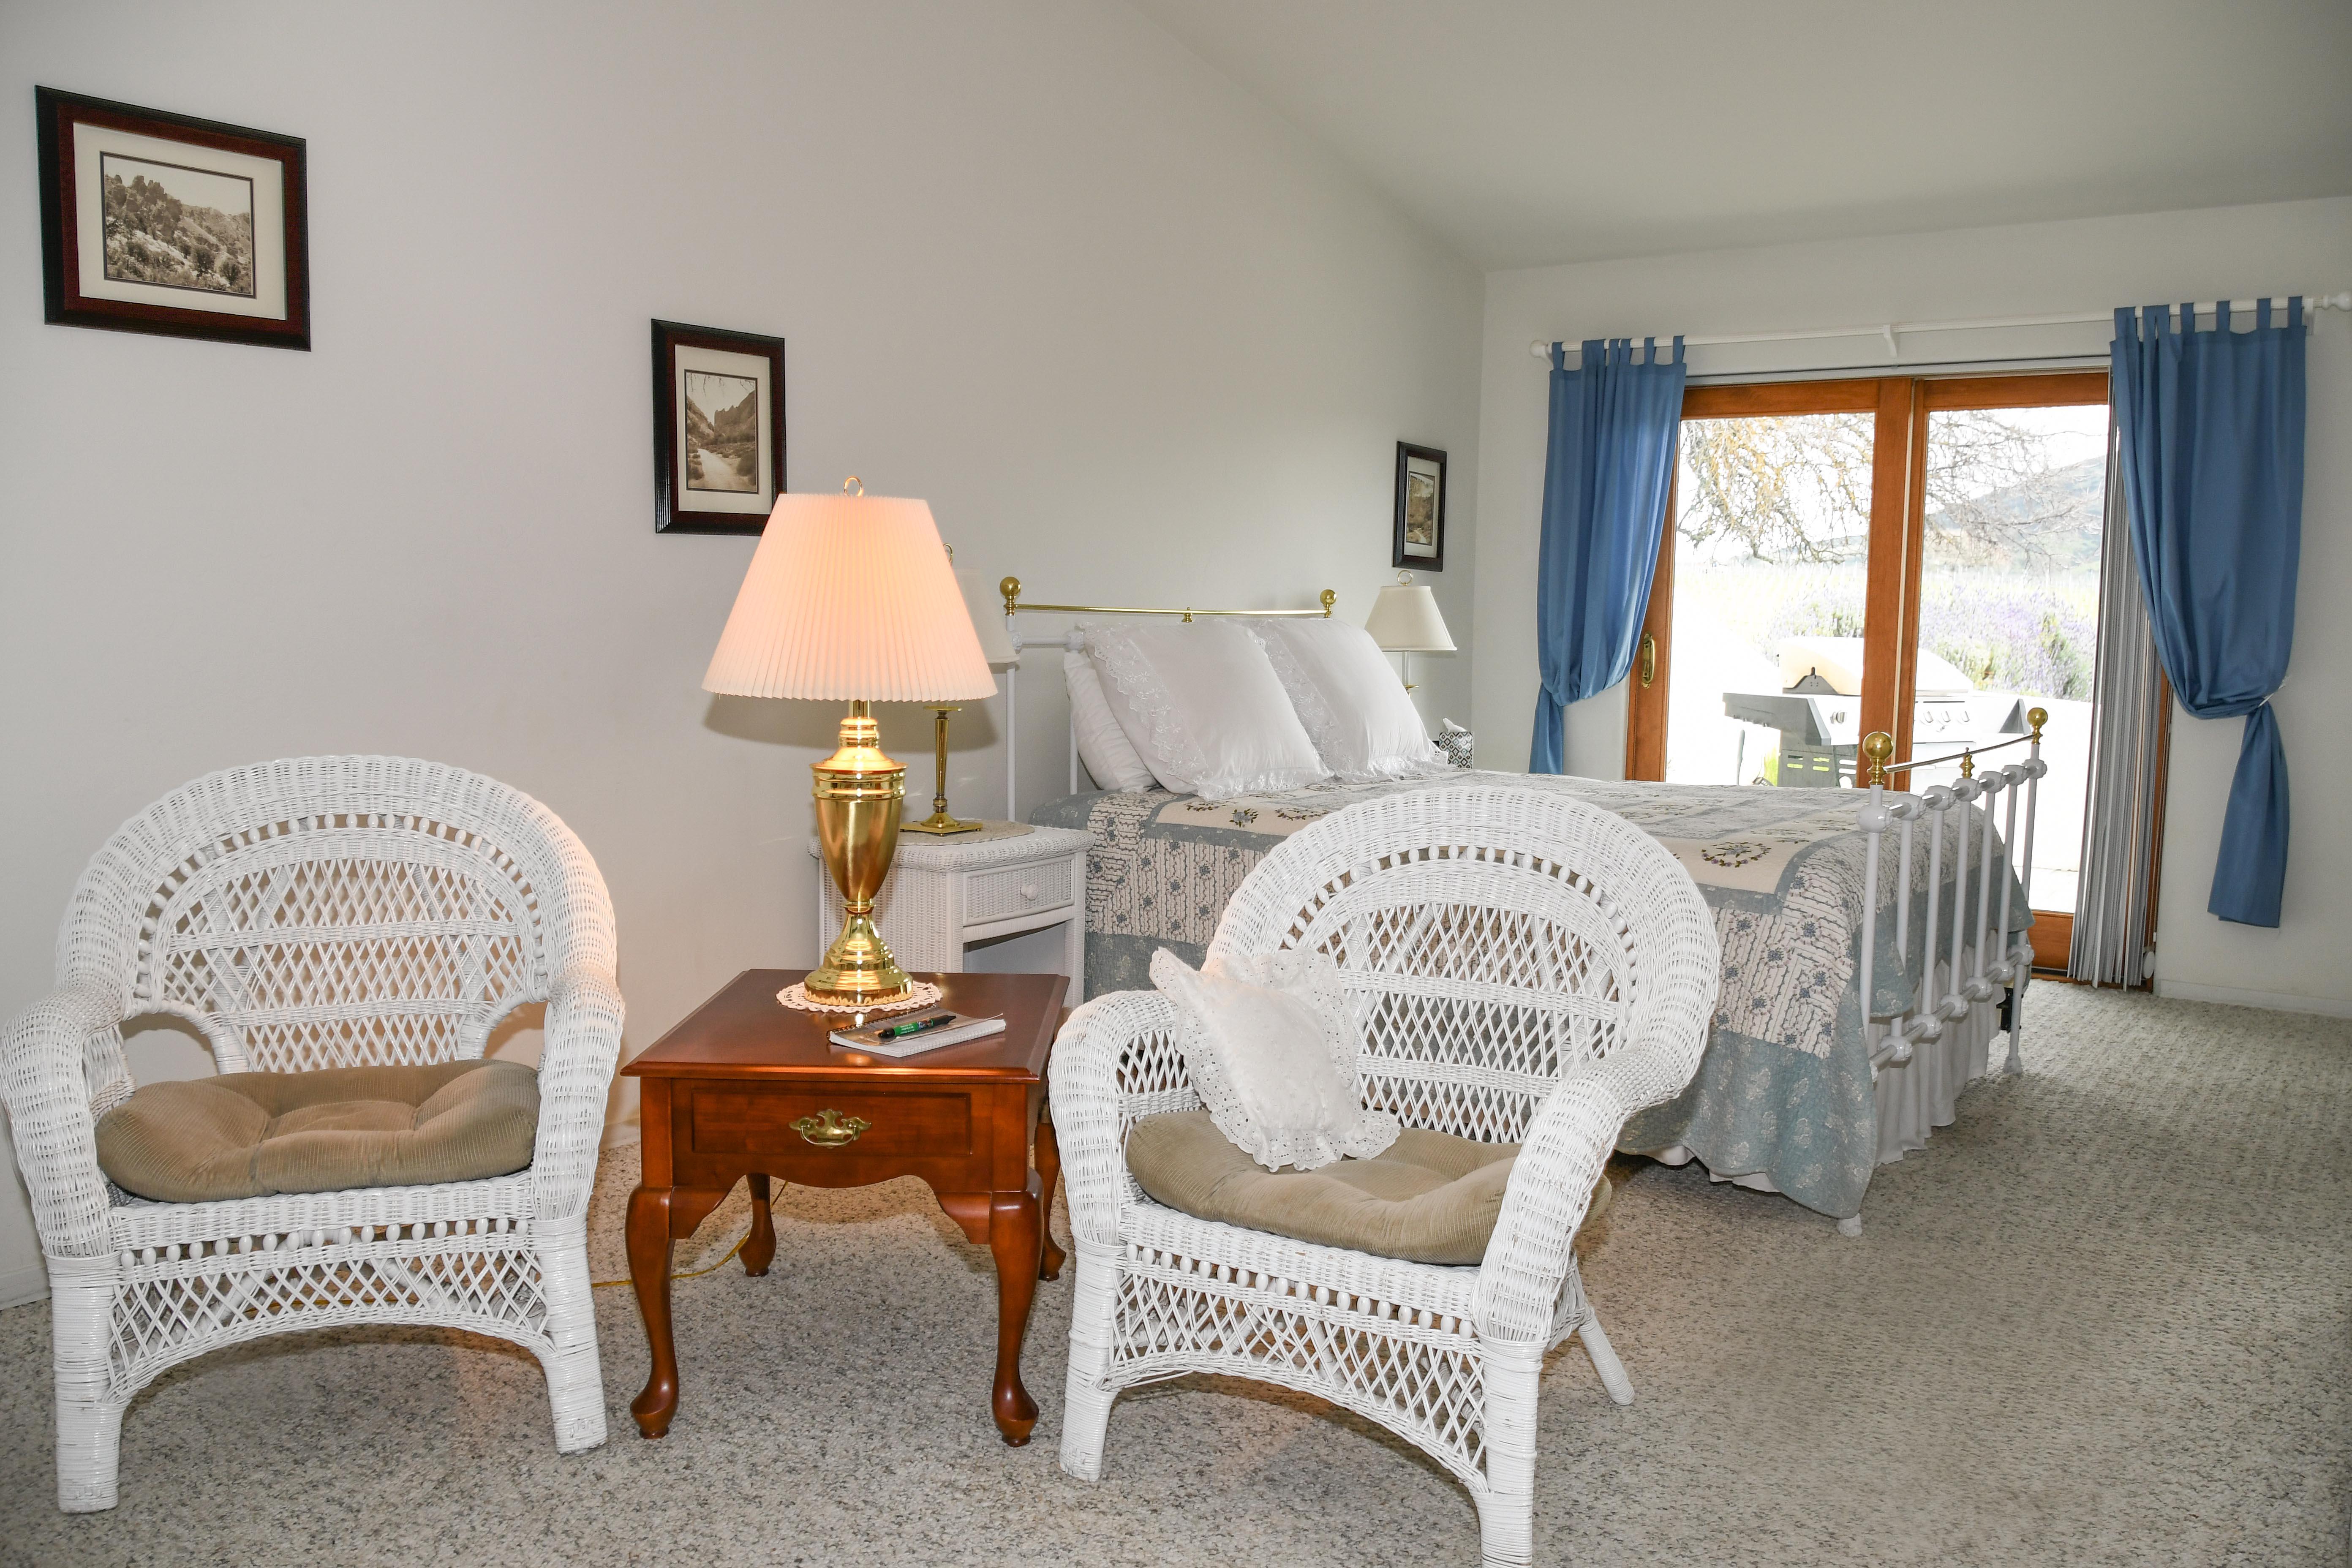 Cottonwood Room 1   Luxury Bed and Breakfast Inn